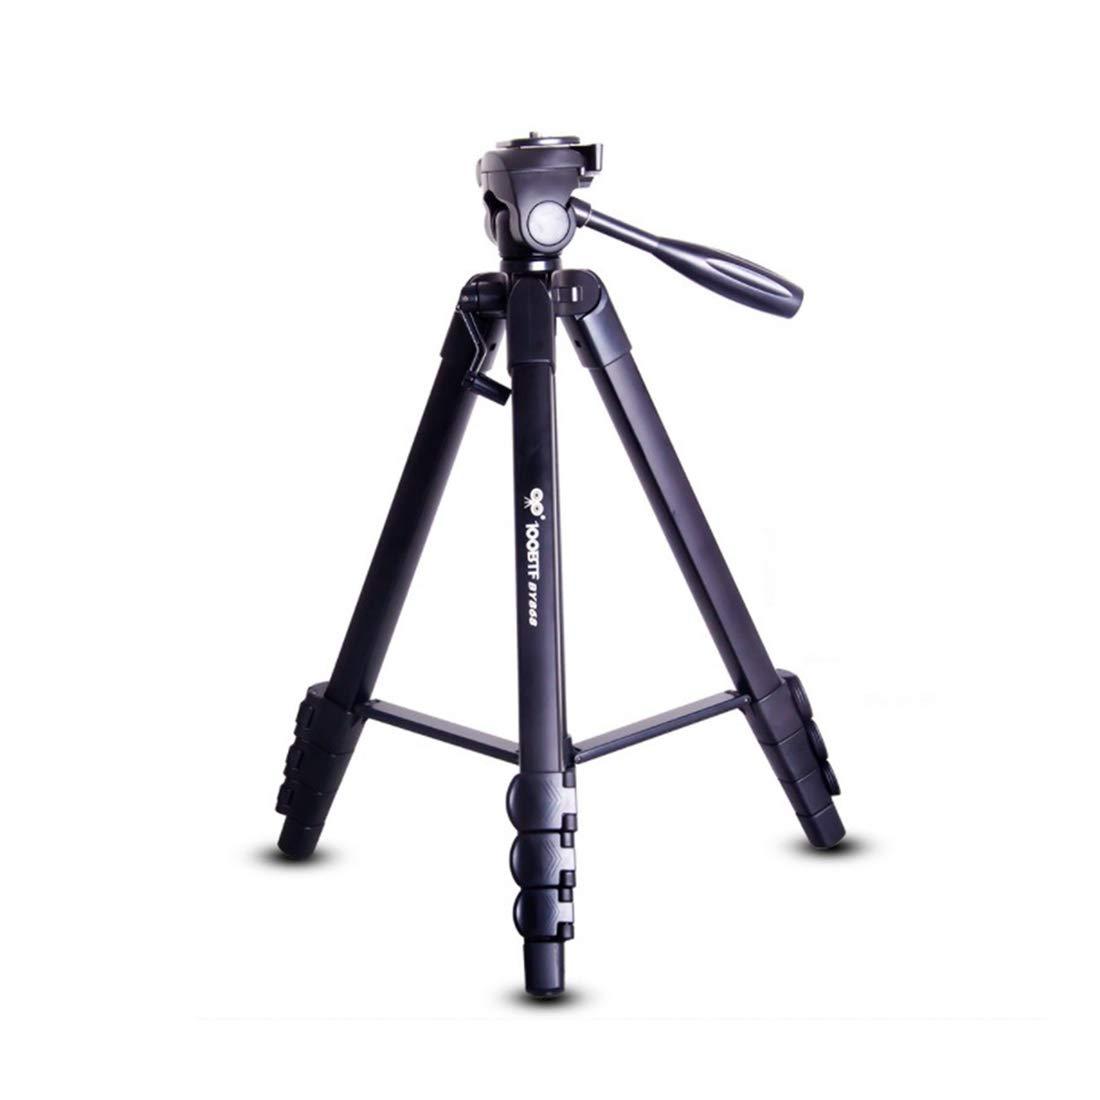 JOYS CLOTHING 単一カメラ三脚カメラサポート写真機器三脚 (Color : ブラック)  ブラック B07L28FWJD